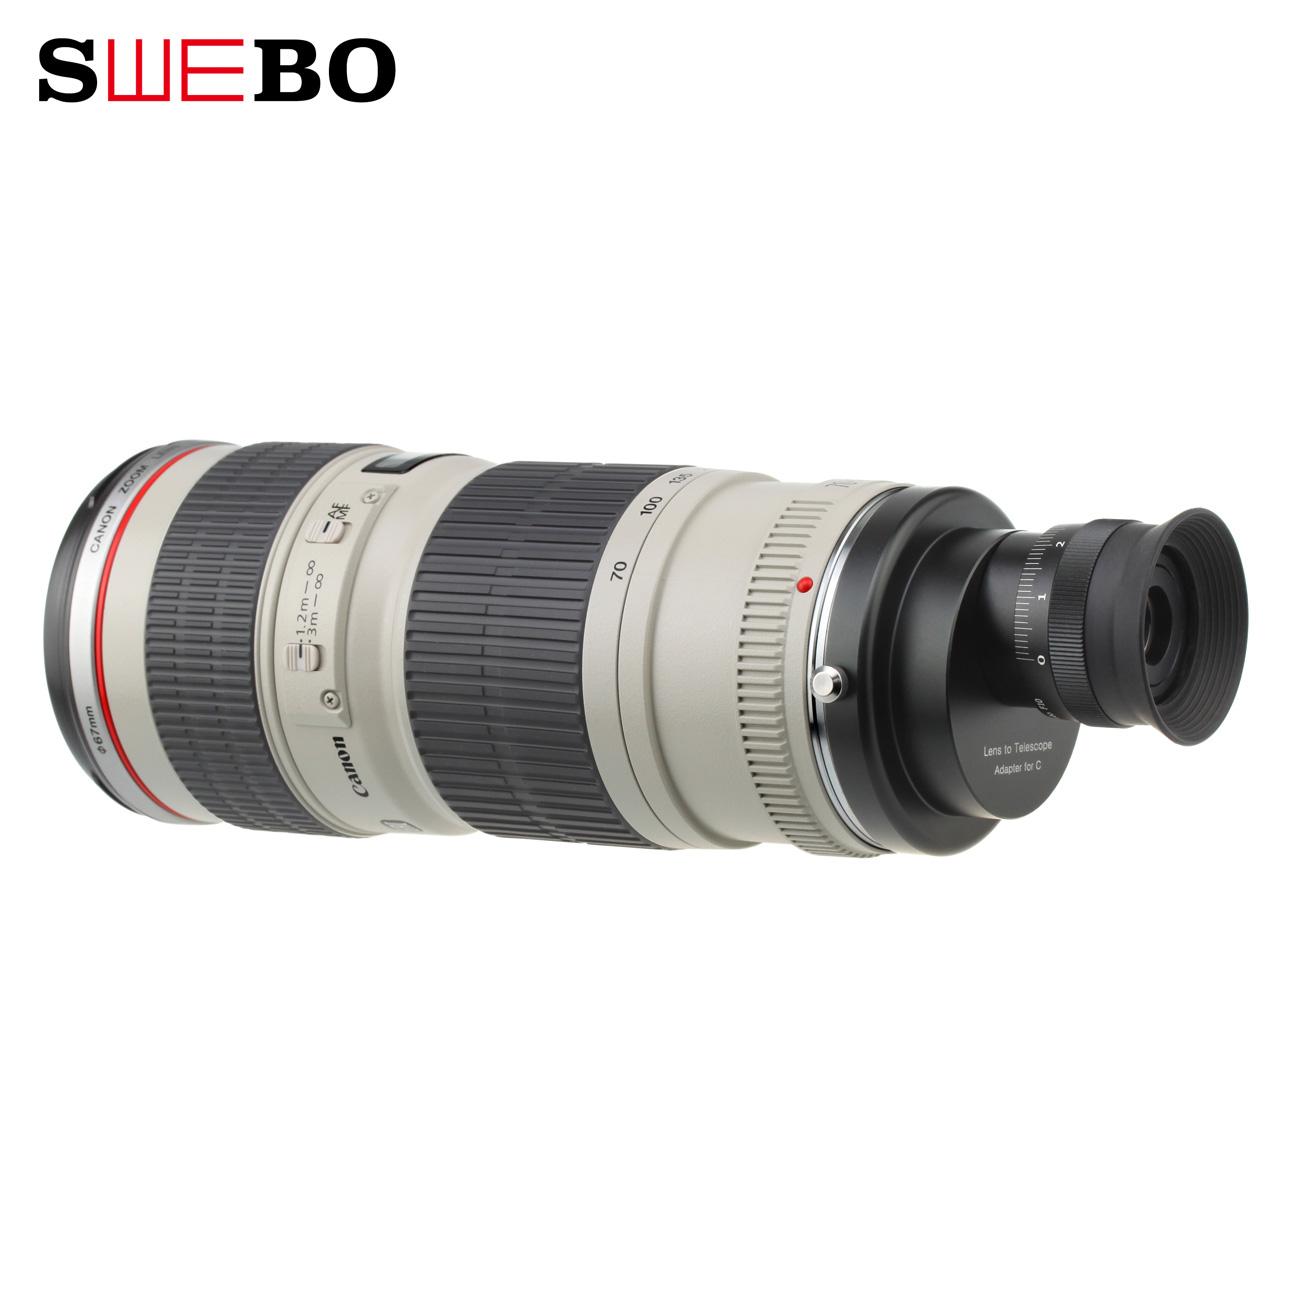 SWEBO 摄望宝四代 与镜头组成高清望远镜 默认佳能口 其他口注明